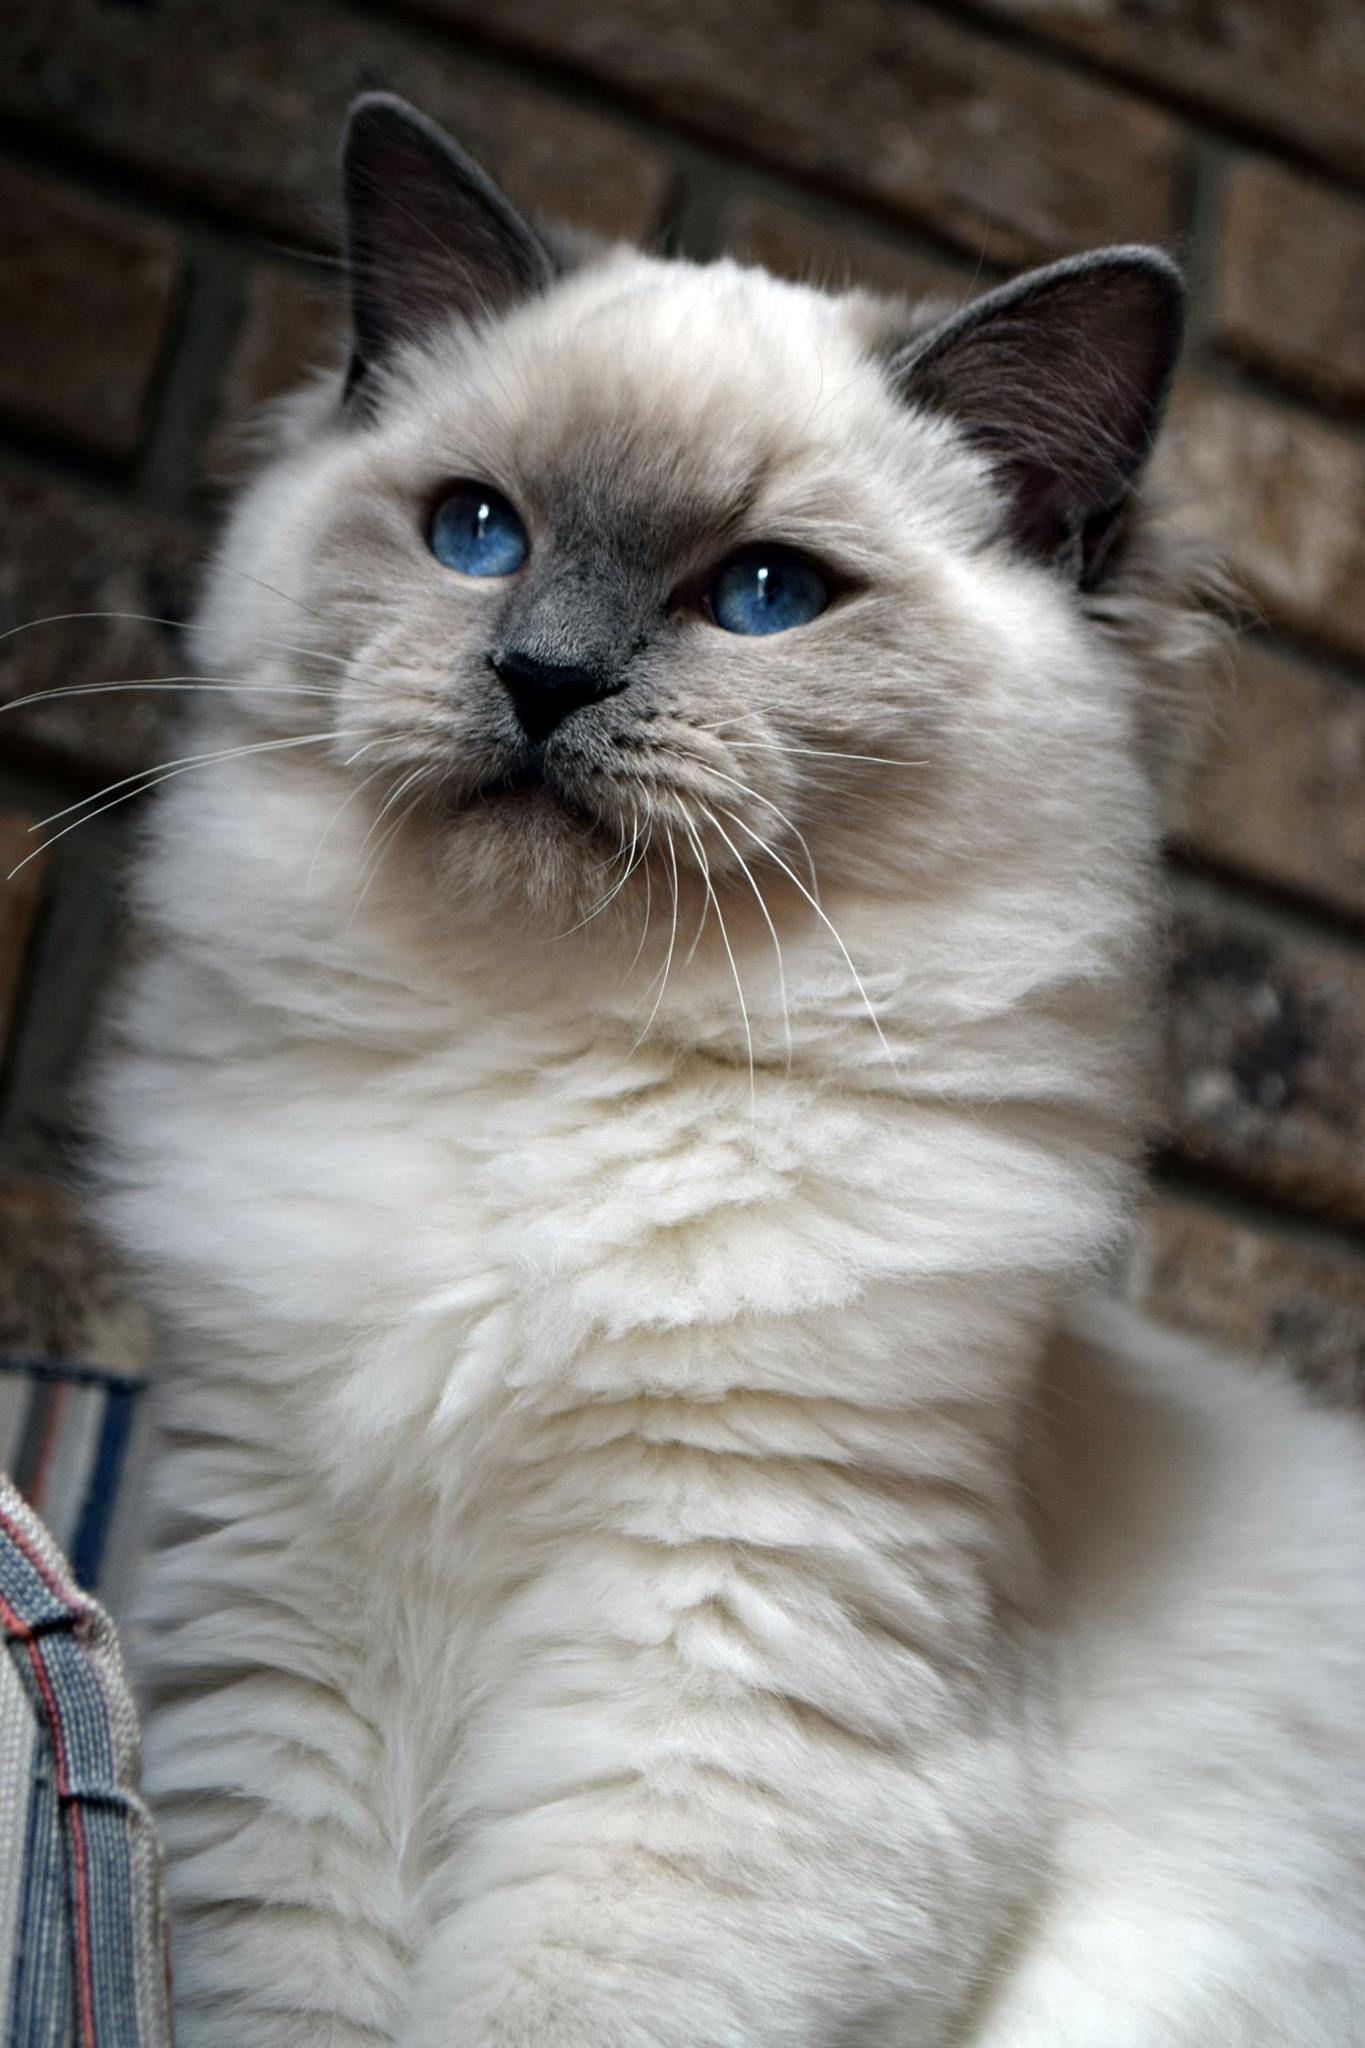 Blue Point Ragdoll Ohemgee Spider Ohemgee Cats Cat Fluffycat Ragdolls Ragdoll Kittens Blueragdoll Bluepoint Bluee Cats Blue Point Ragdoll Tabby Cat